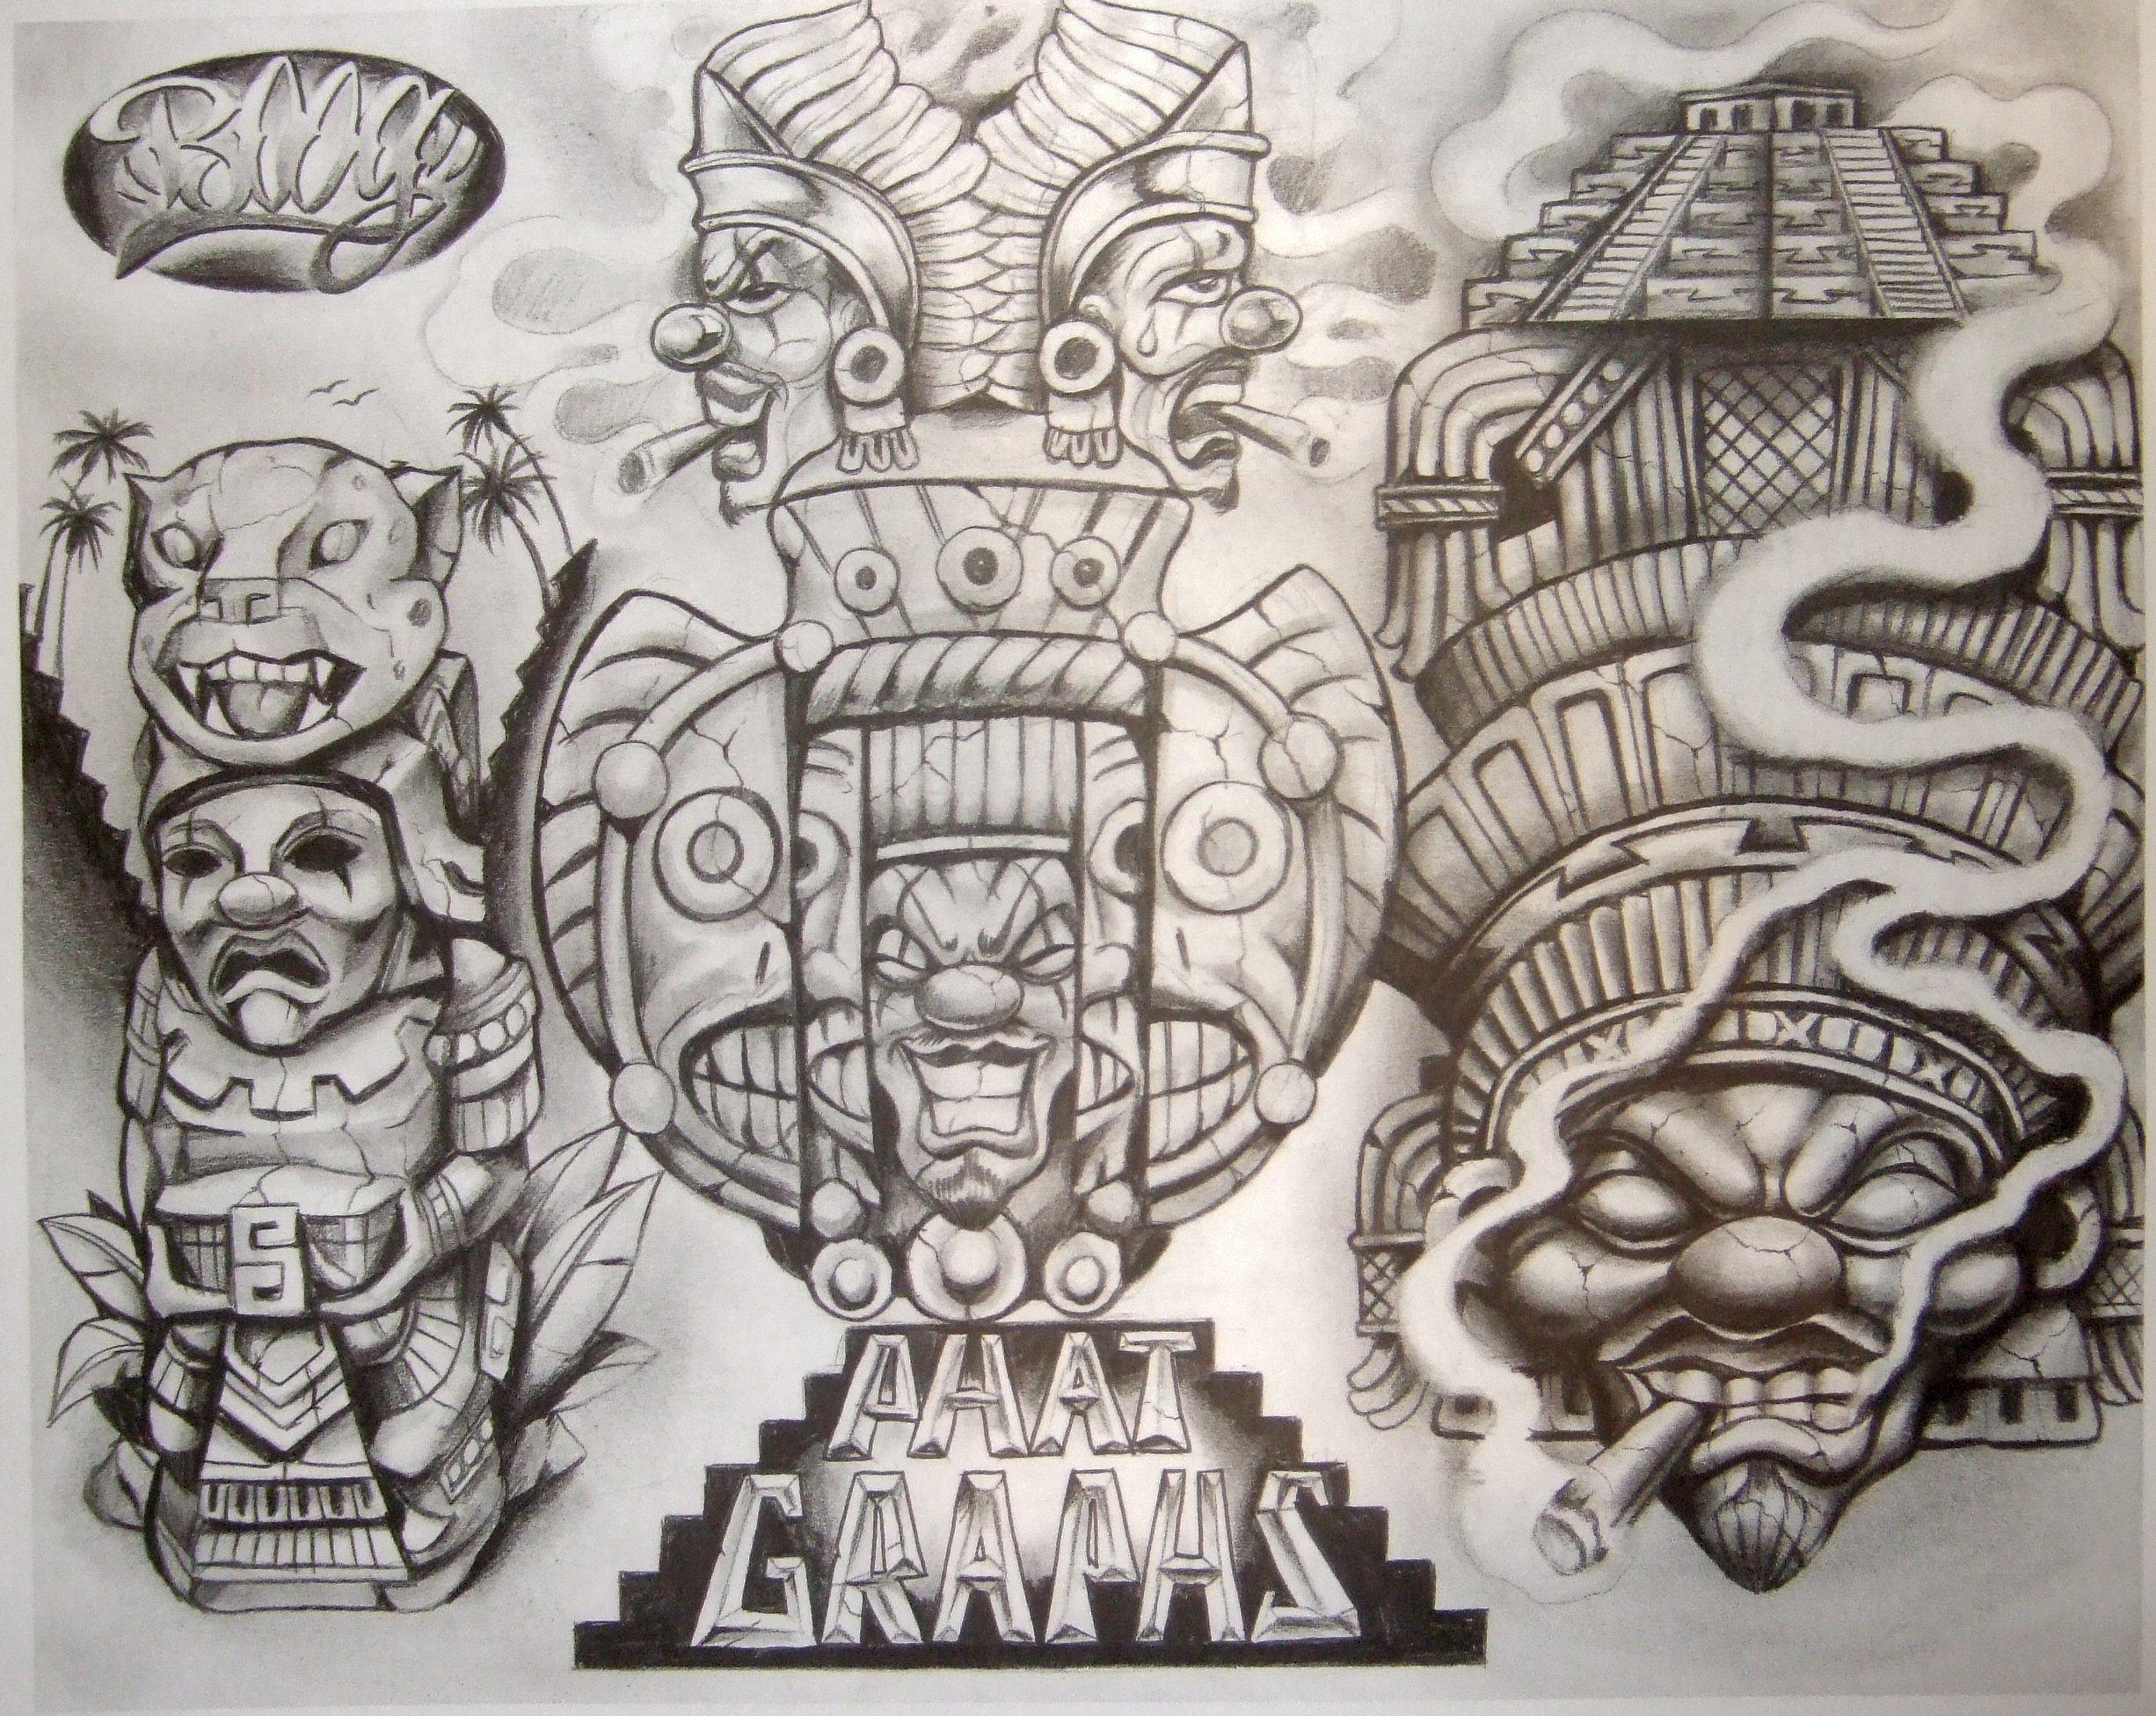 Boog Flash Black And Grey Tattoos Tattoo Artists